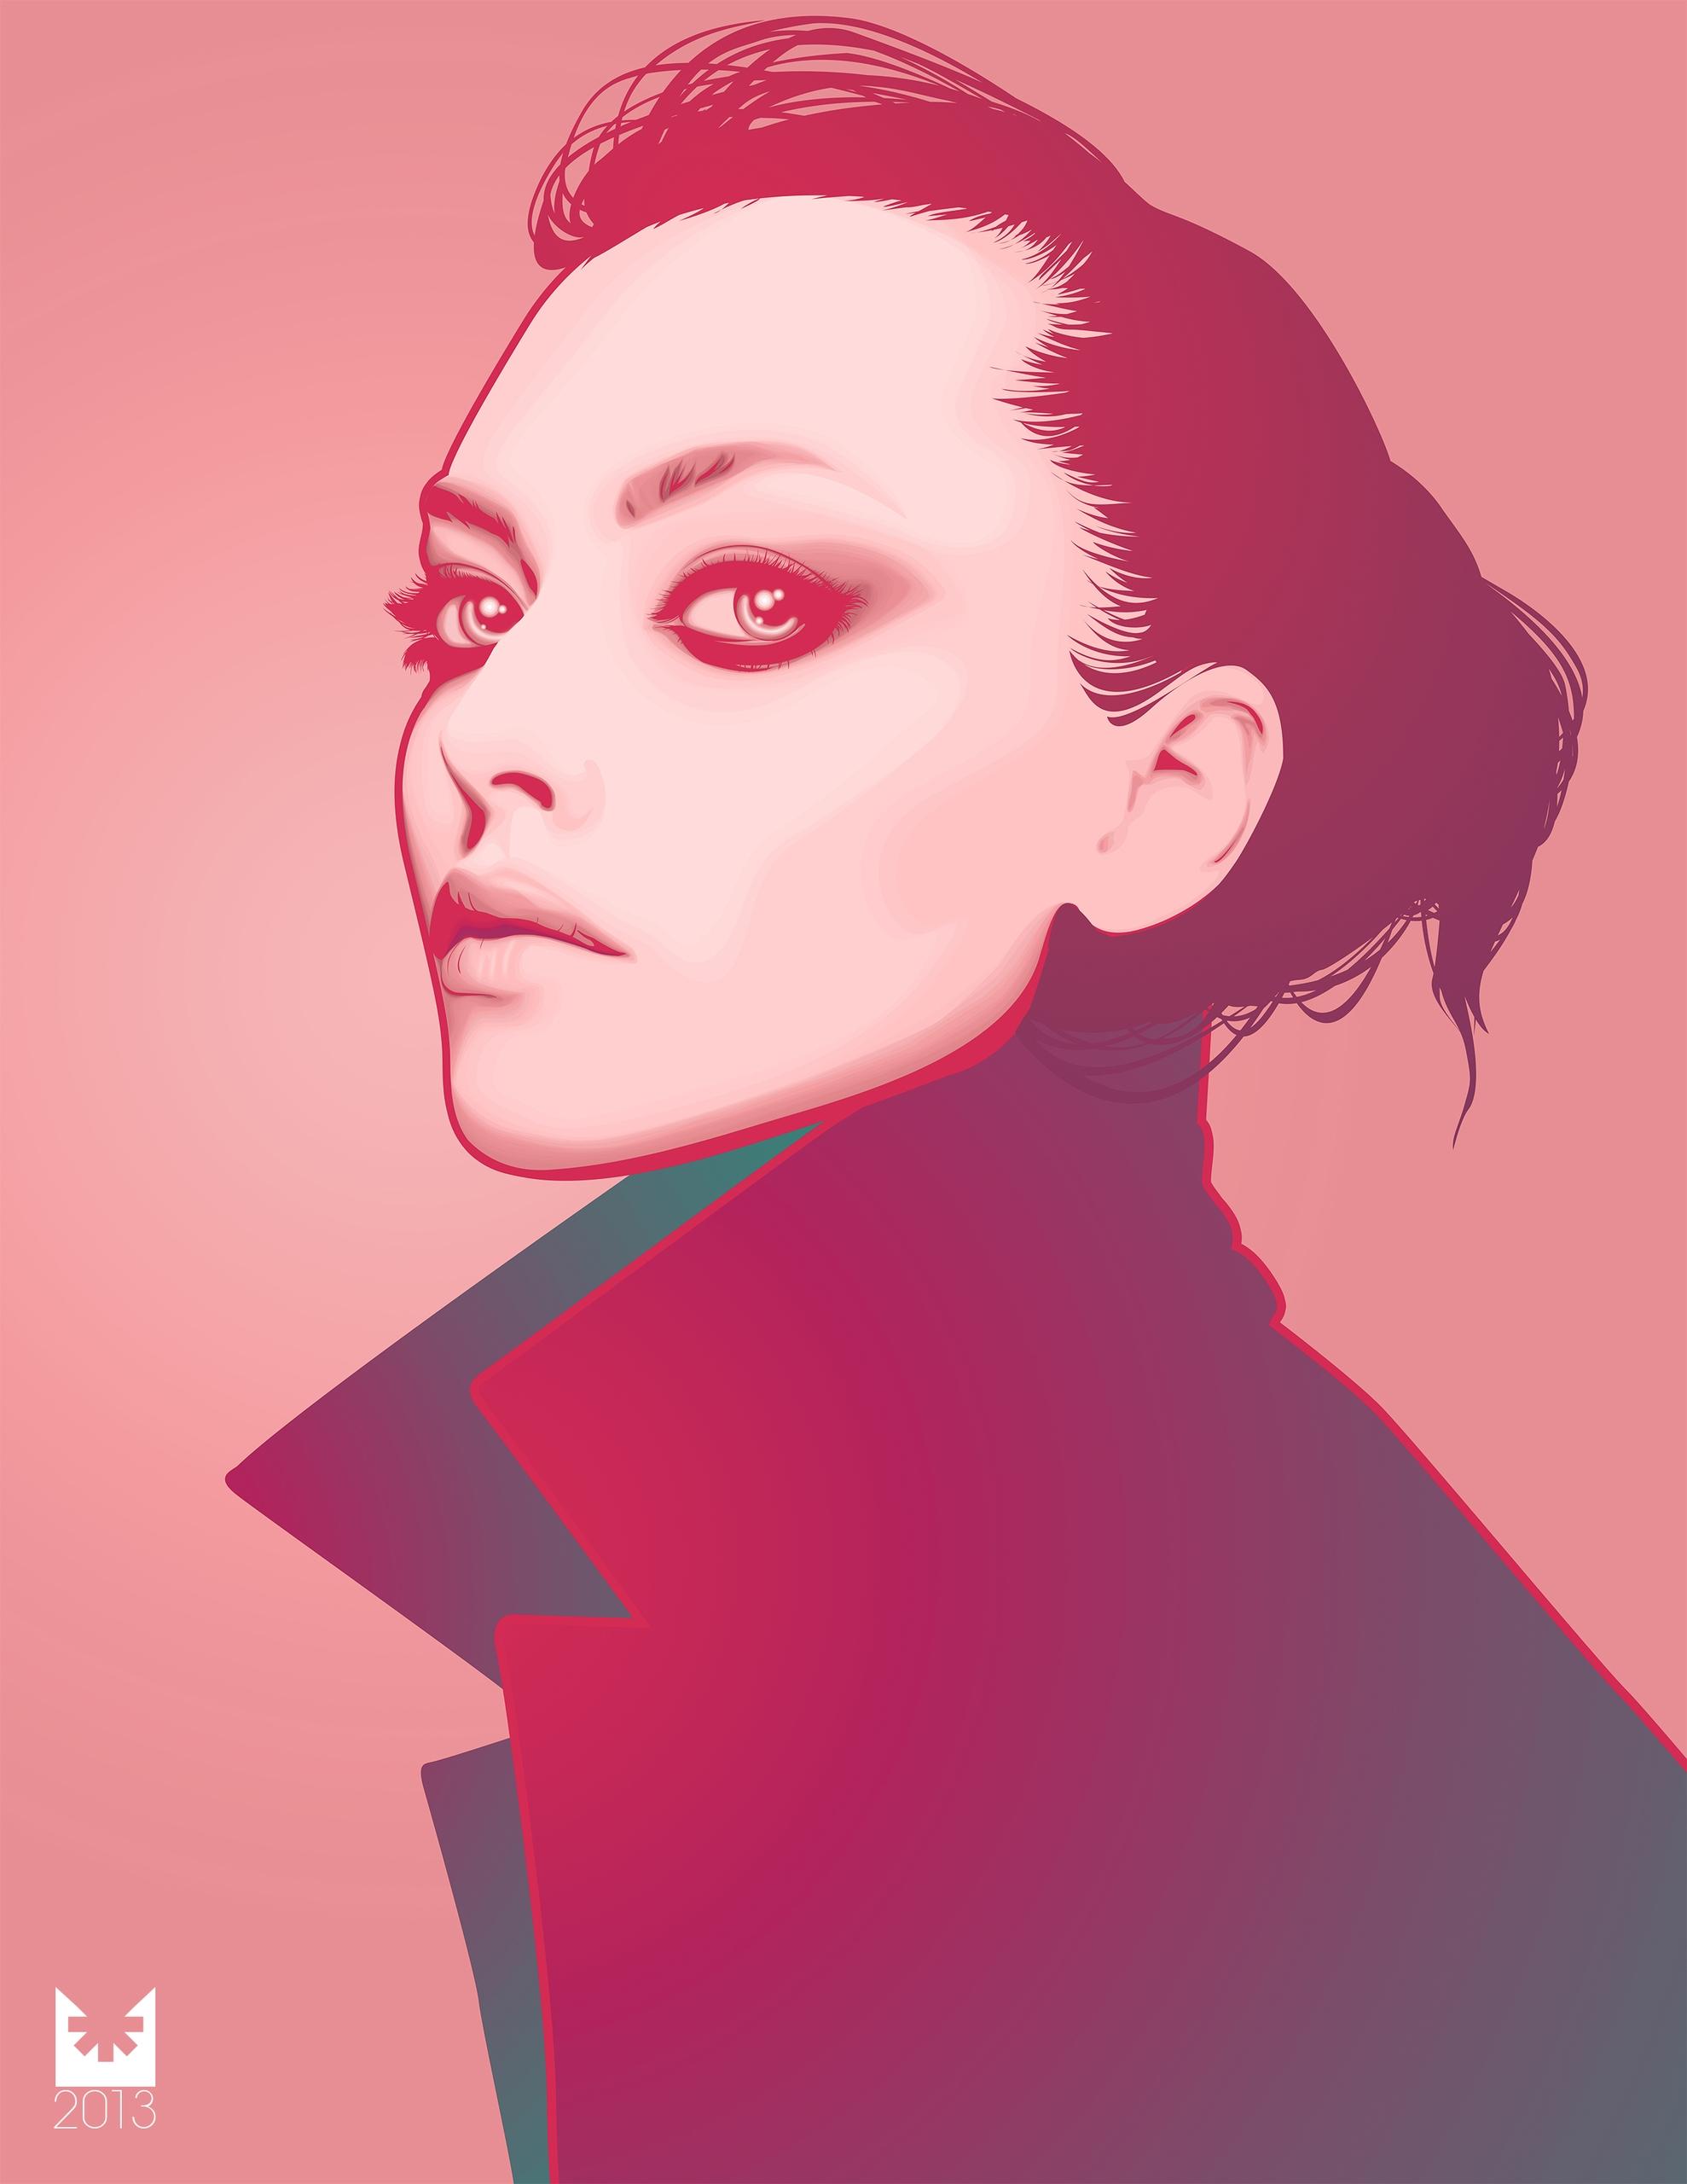 AMANDA SEYFRIED Vector Portrait - bossmarx | ello